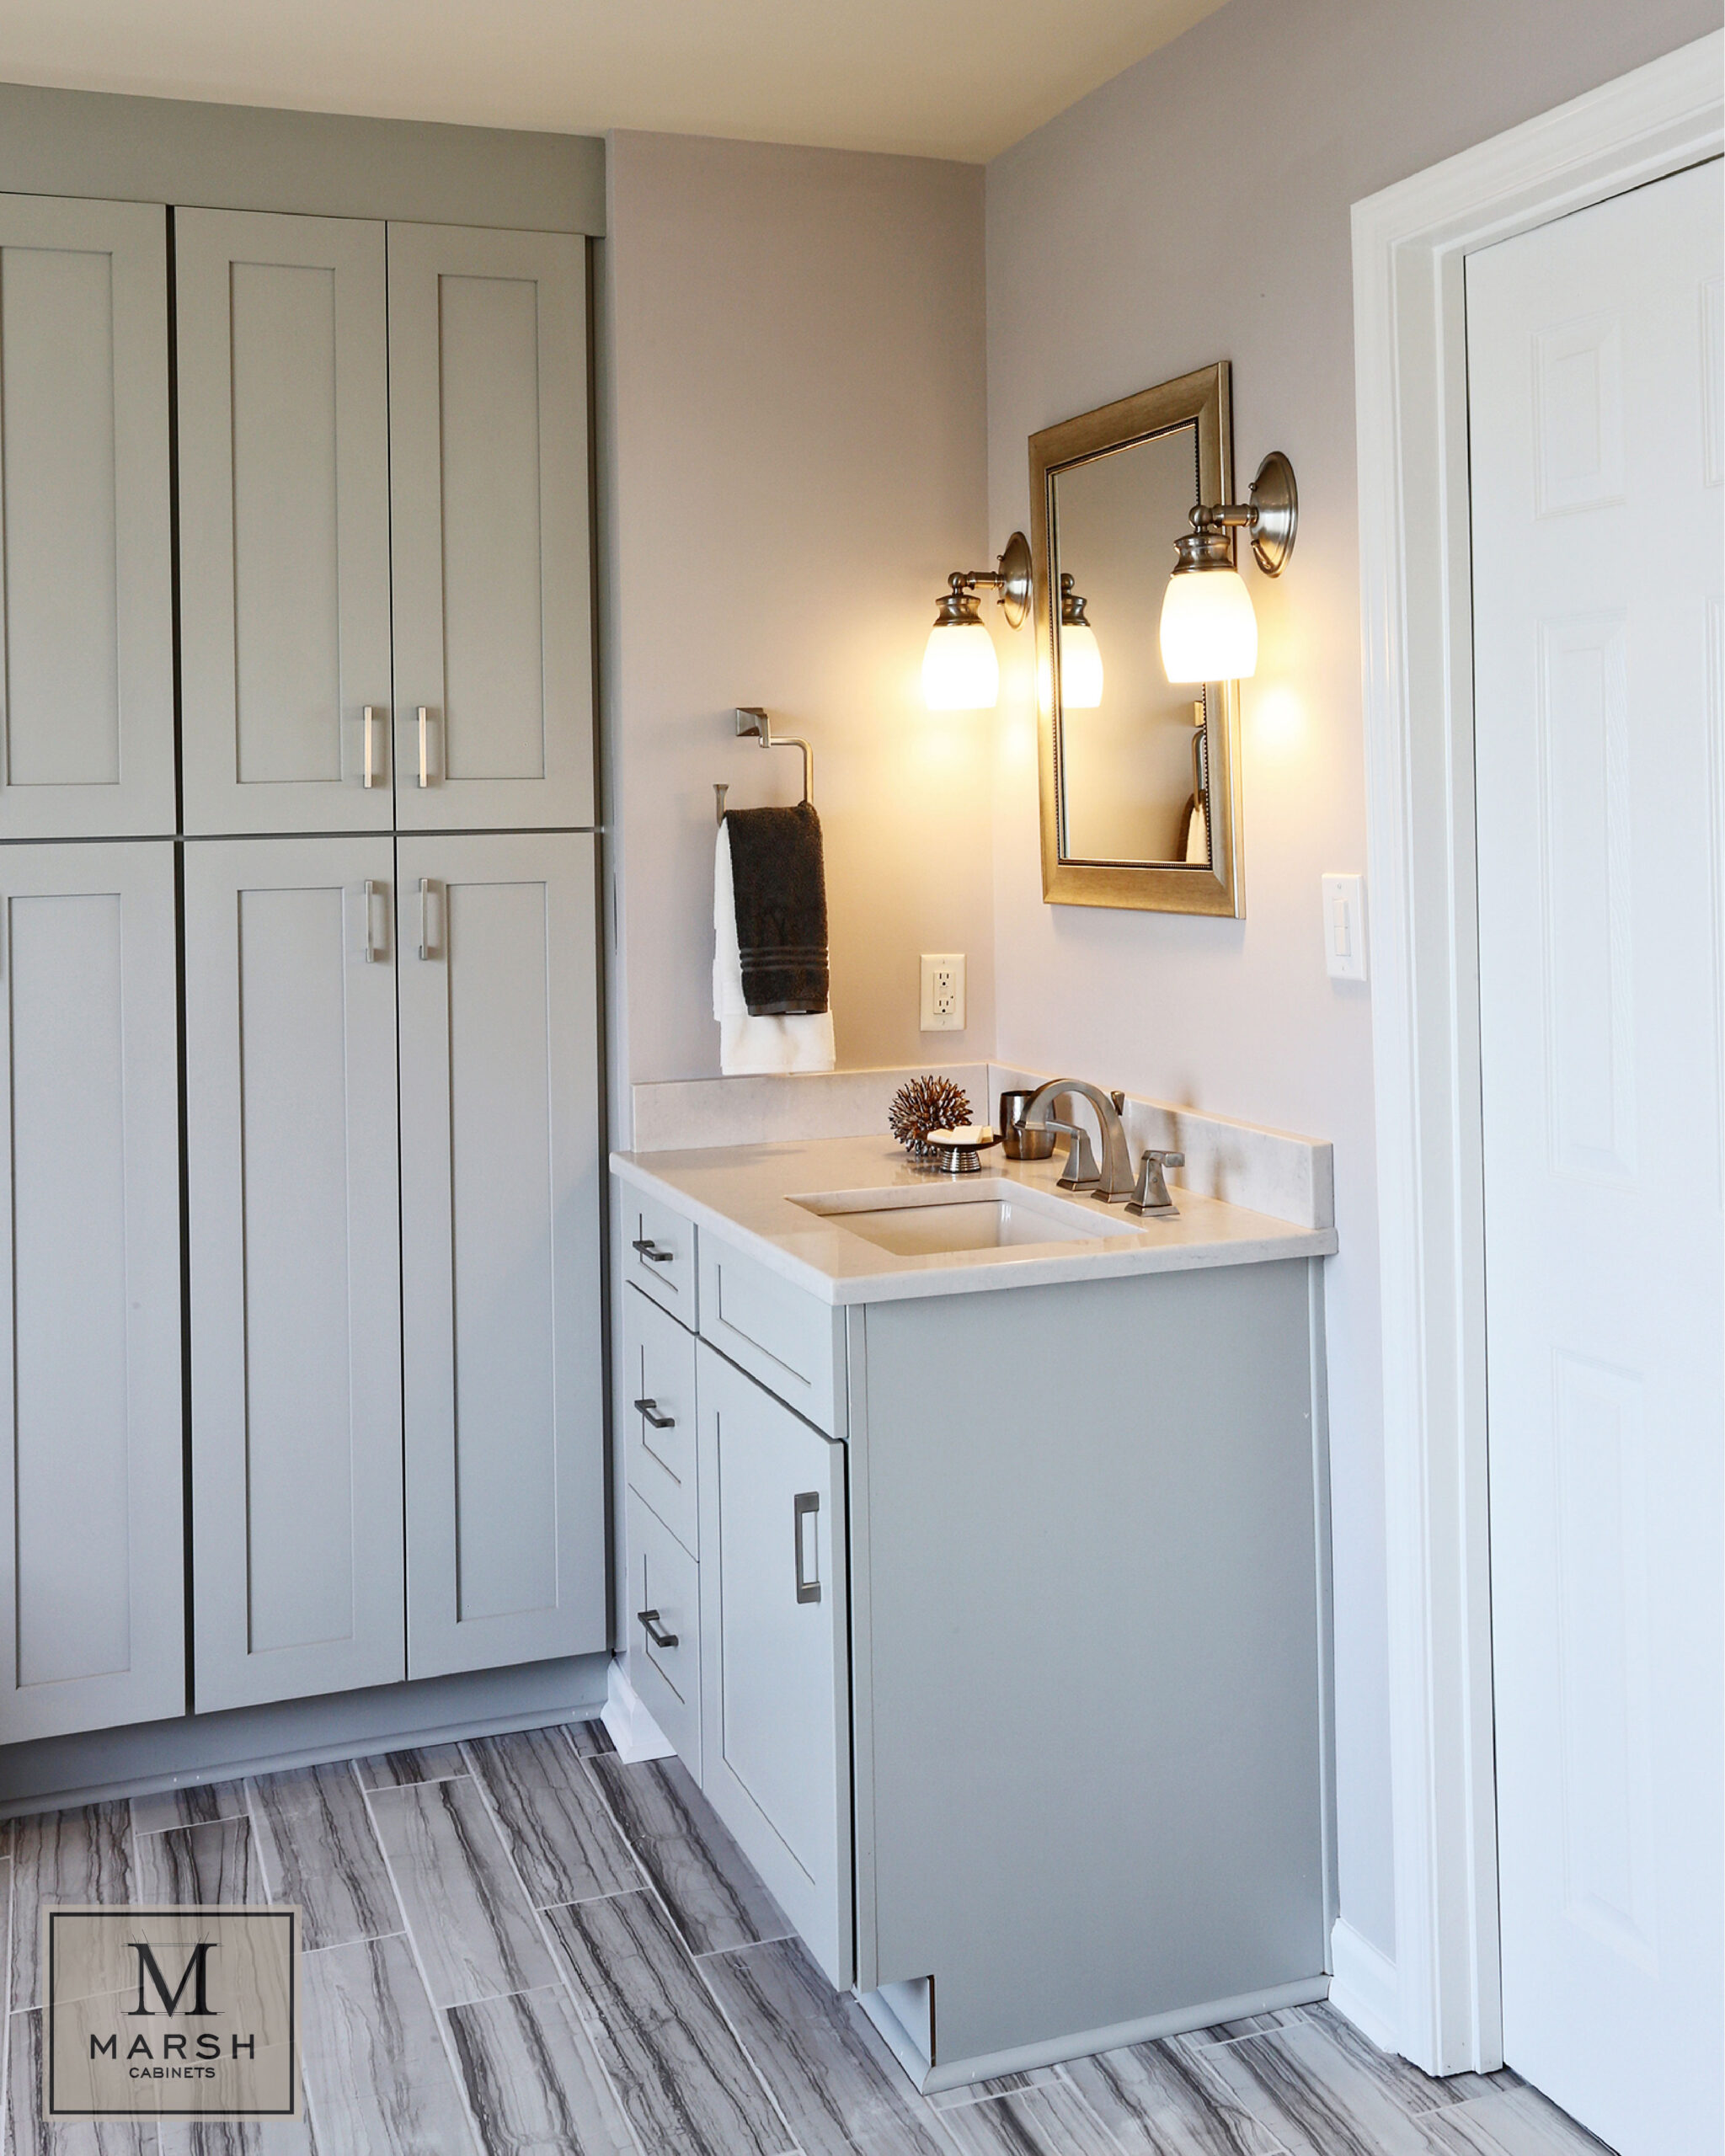 Kitchen Cabinets Raleigh Modern Summerfield Greystone Paint Shaker Quartz Vanity